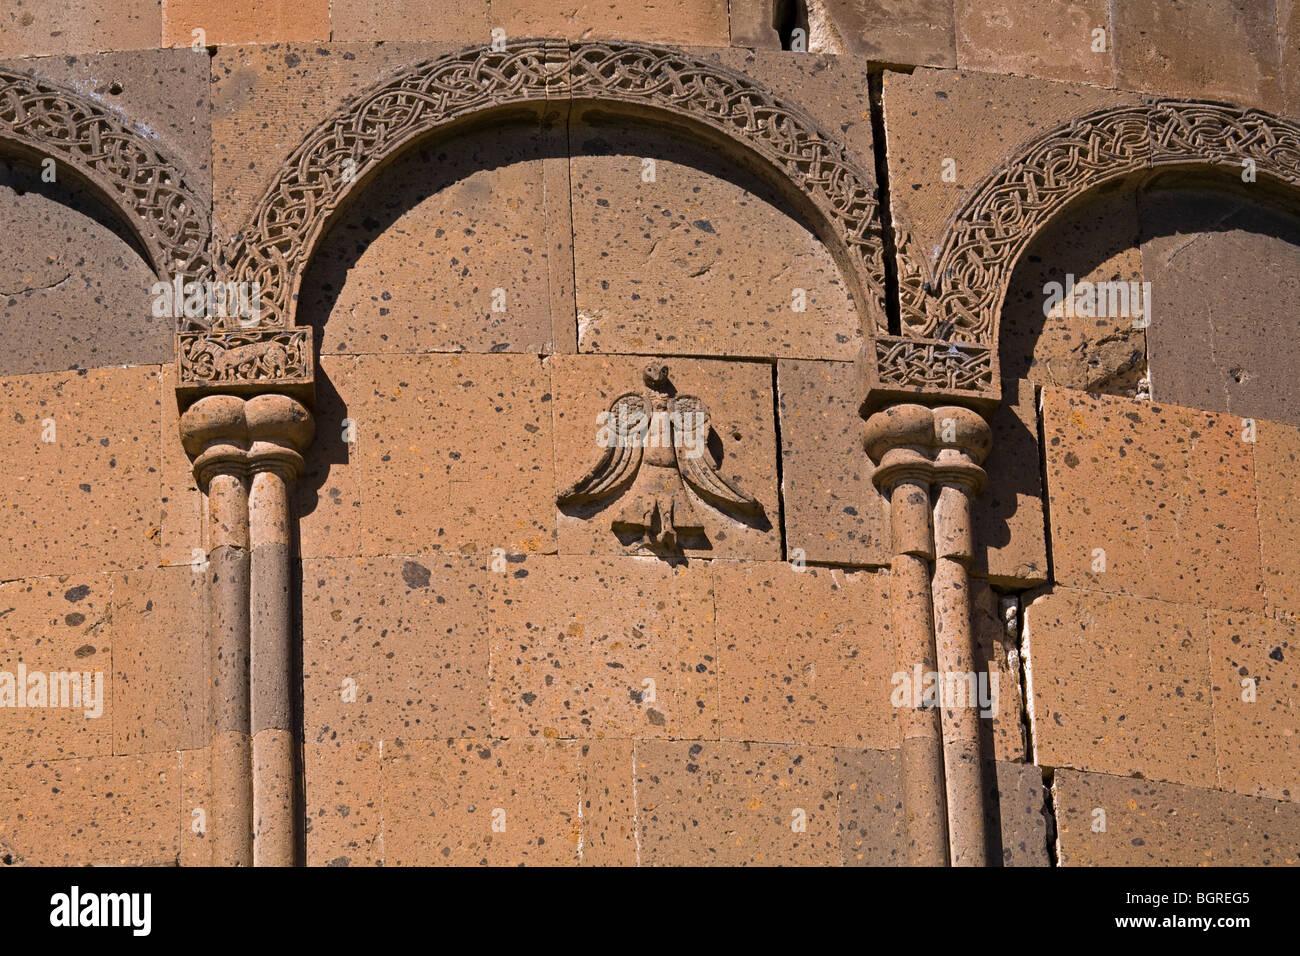 Ruins of the medieval Armenian city of Ani Kars Turkey Stock Photo